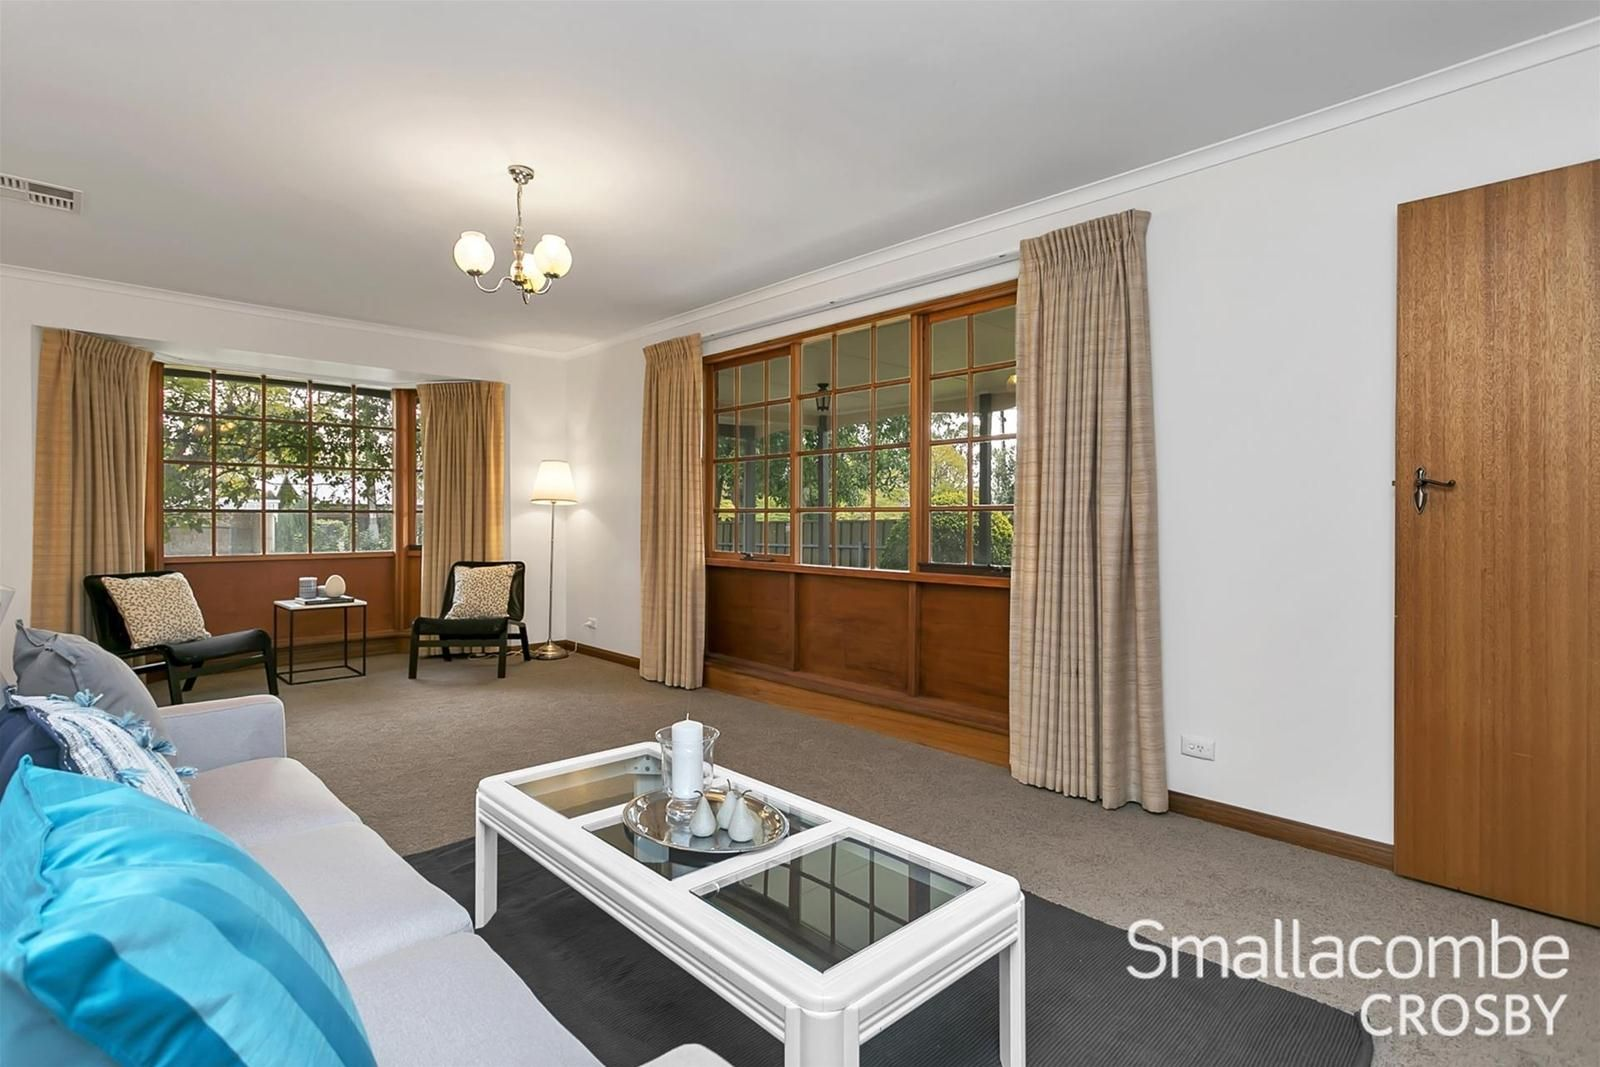 12 Peroomba Avenue, Kensington Gardens SA 5068 - House For Sale | Domain